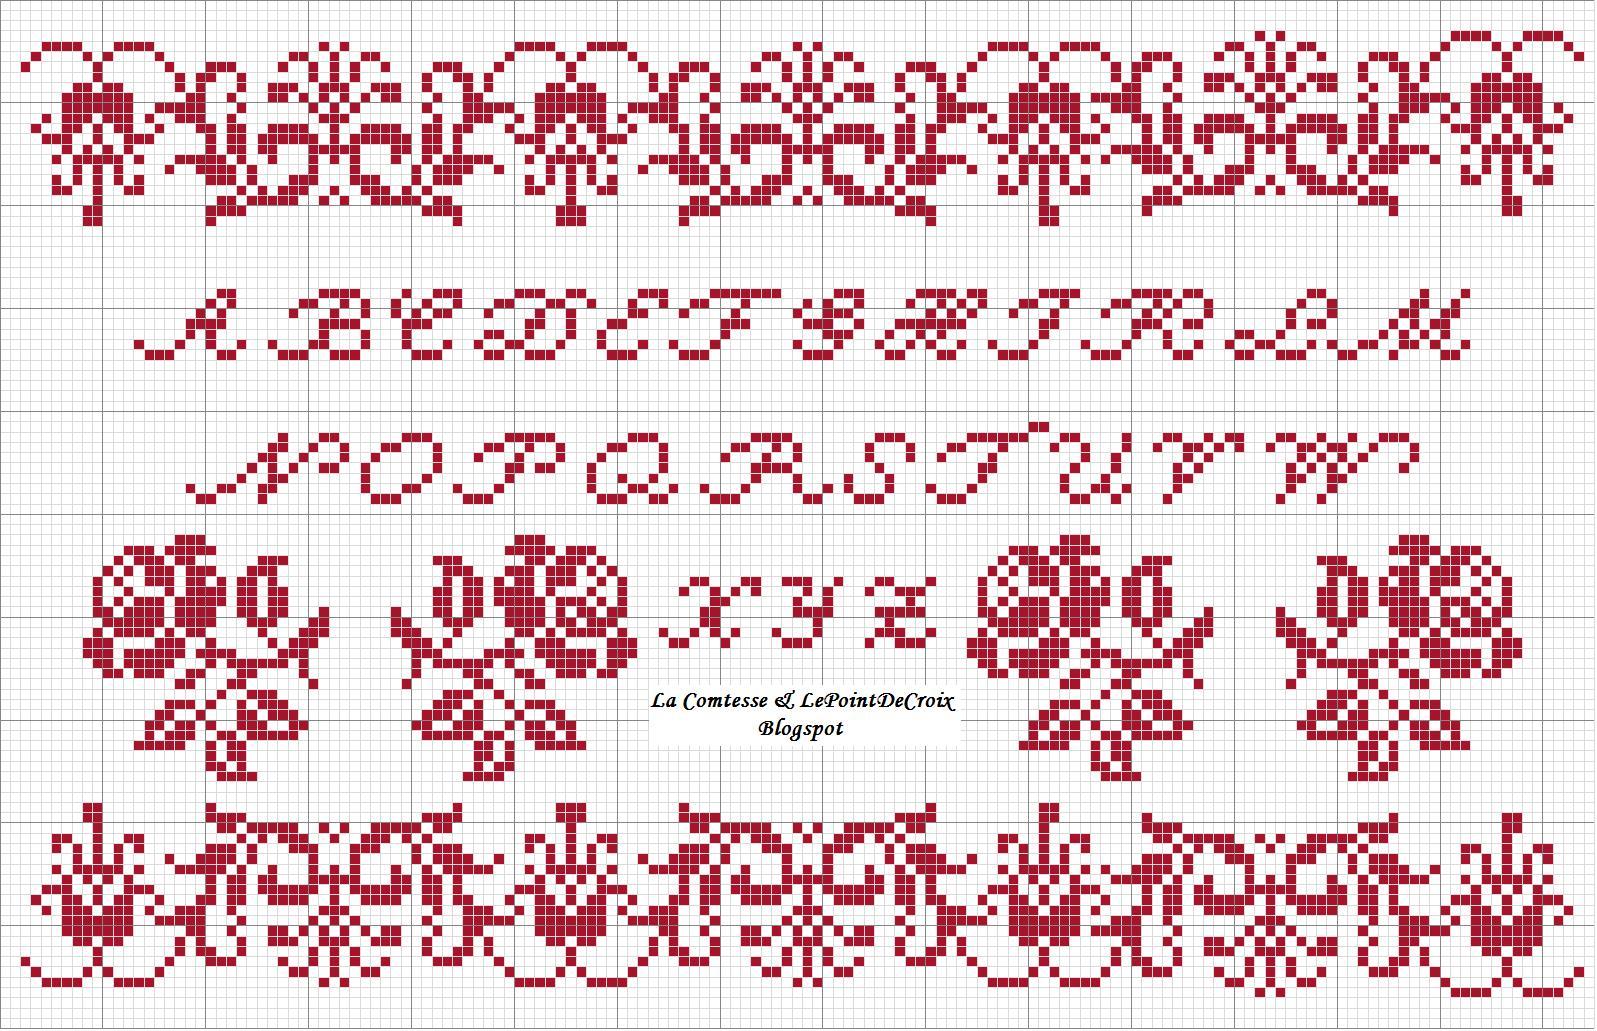 La comtesse le point de croix alfabeto rose for Sognare asciugamani